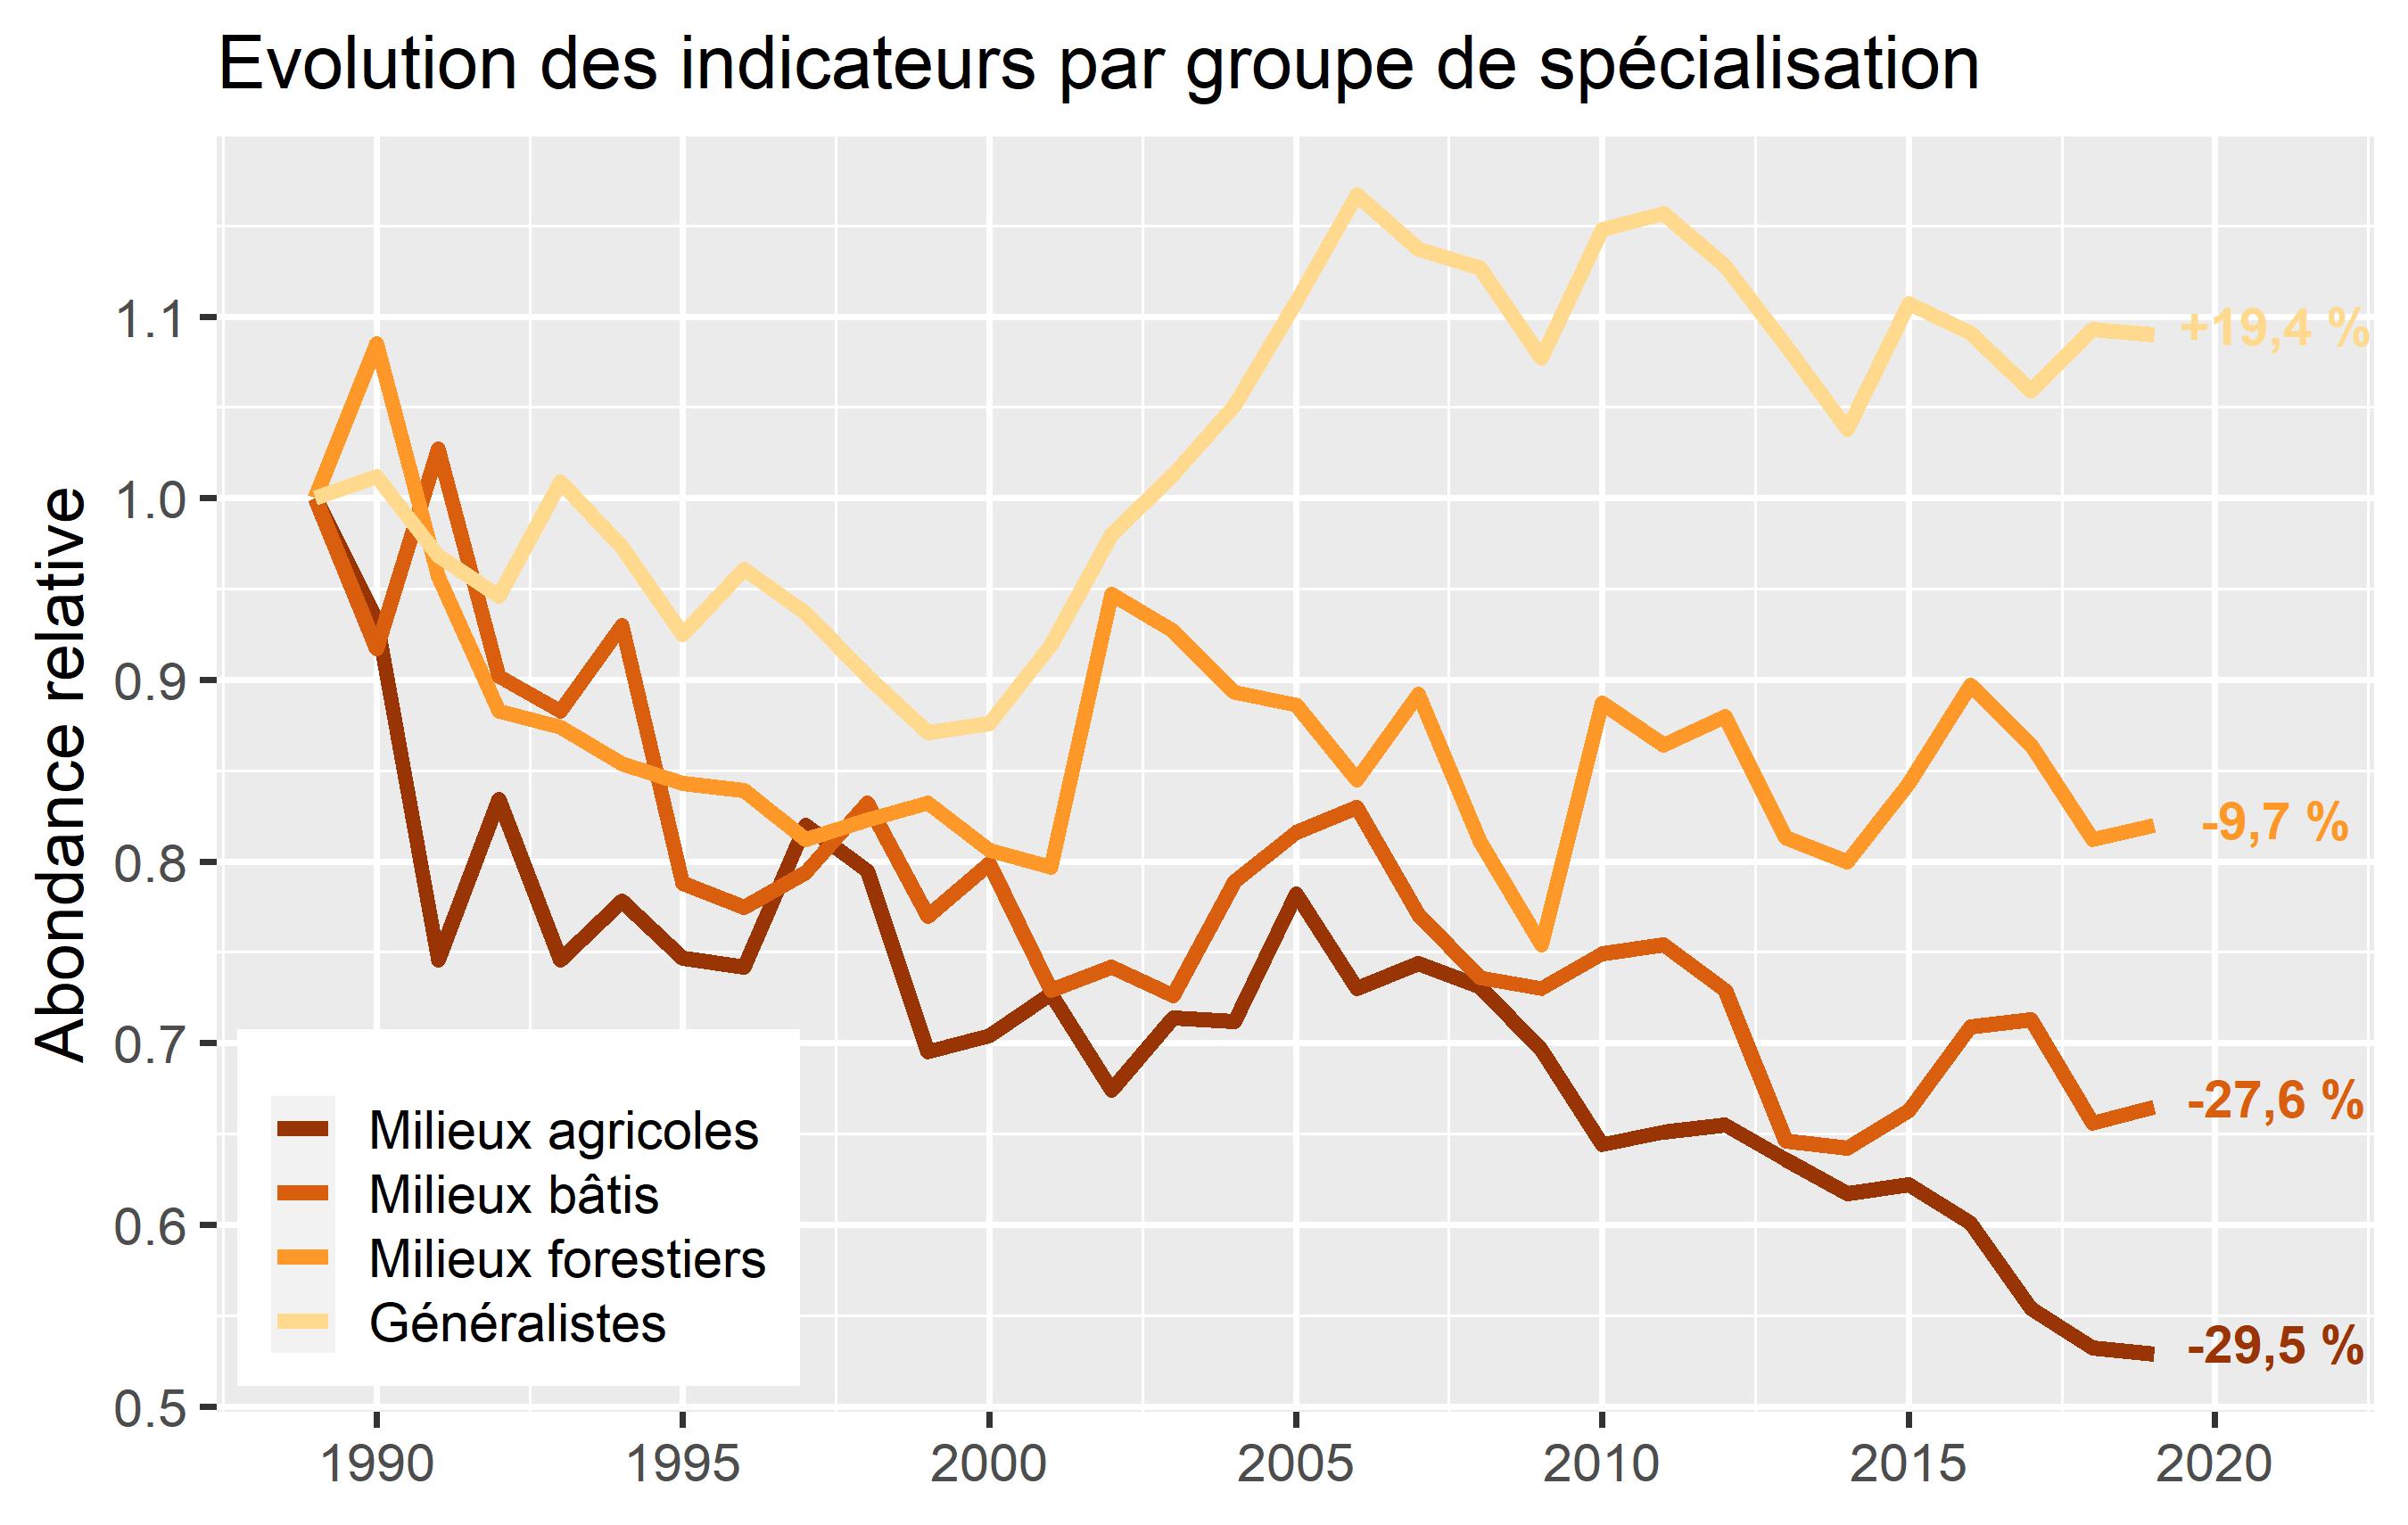 https://cdnfiles1.biolovision.net/www.faune-france.org/userfiles/FauneFrance/FFAltasEnqutes/STOCindicateurs.png